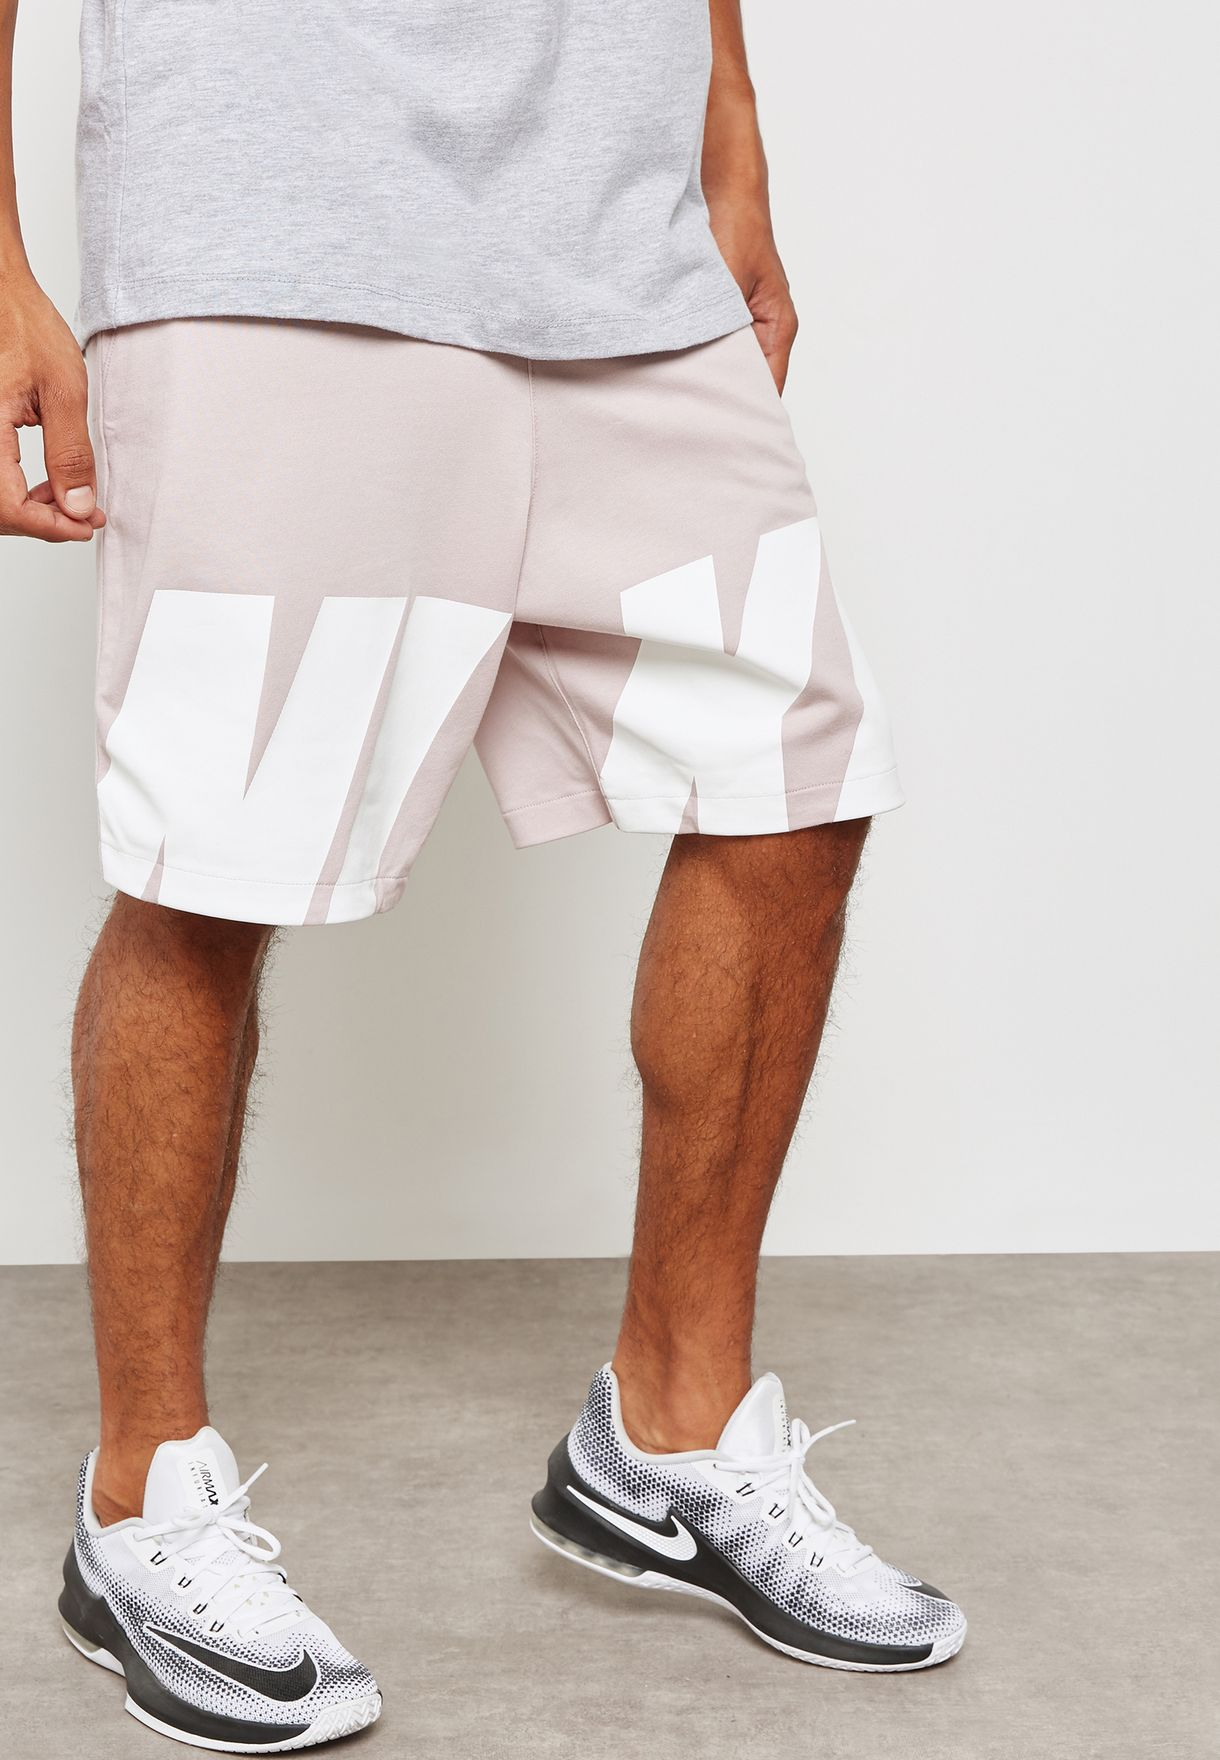 c8fa4 35b57 nike hybrid shorts store - newsbdonline.com 1824ad1a6